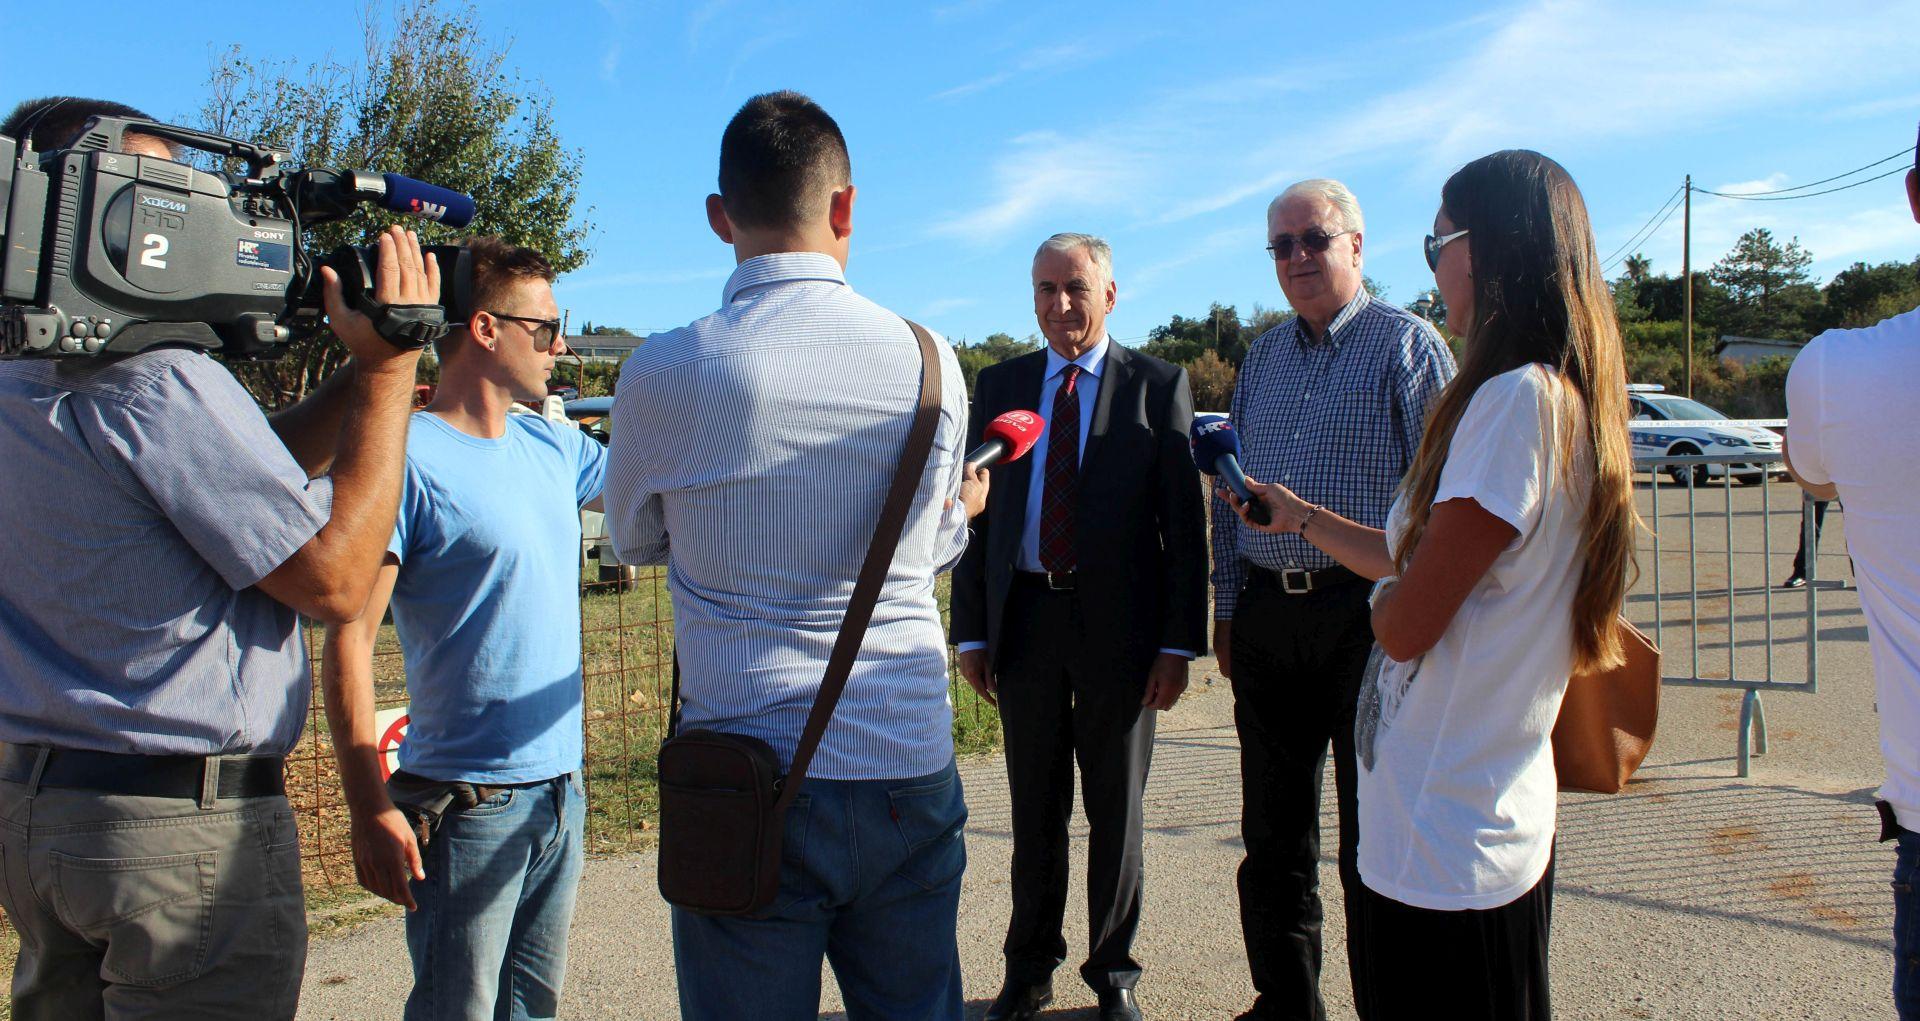 NAČELNIK KONAVLA Korda: Krši se međunarodni ugovor o razvojačenju Prevlake